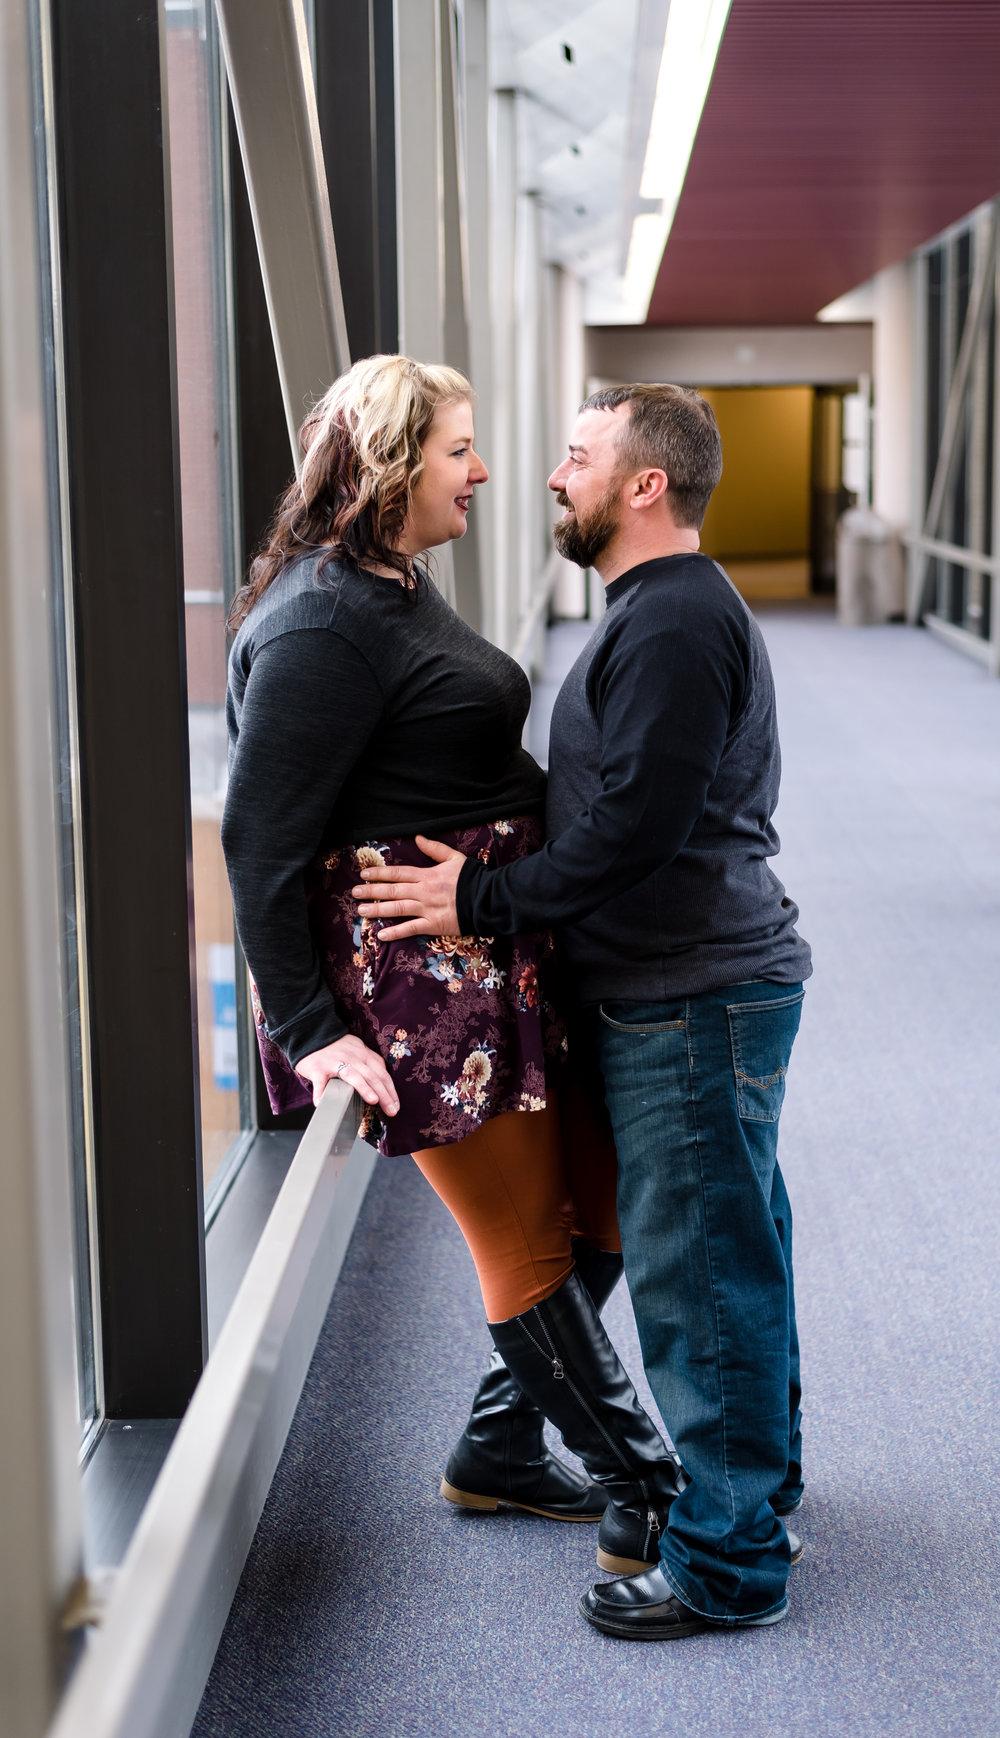 Downtown Fargo Engagement Pictures | Chelsea Joy Photography